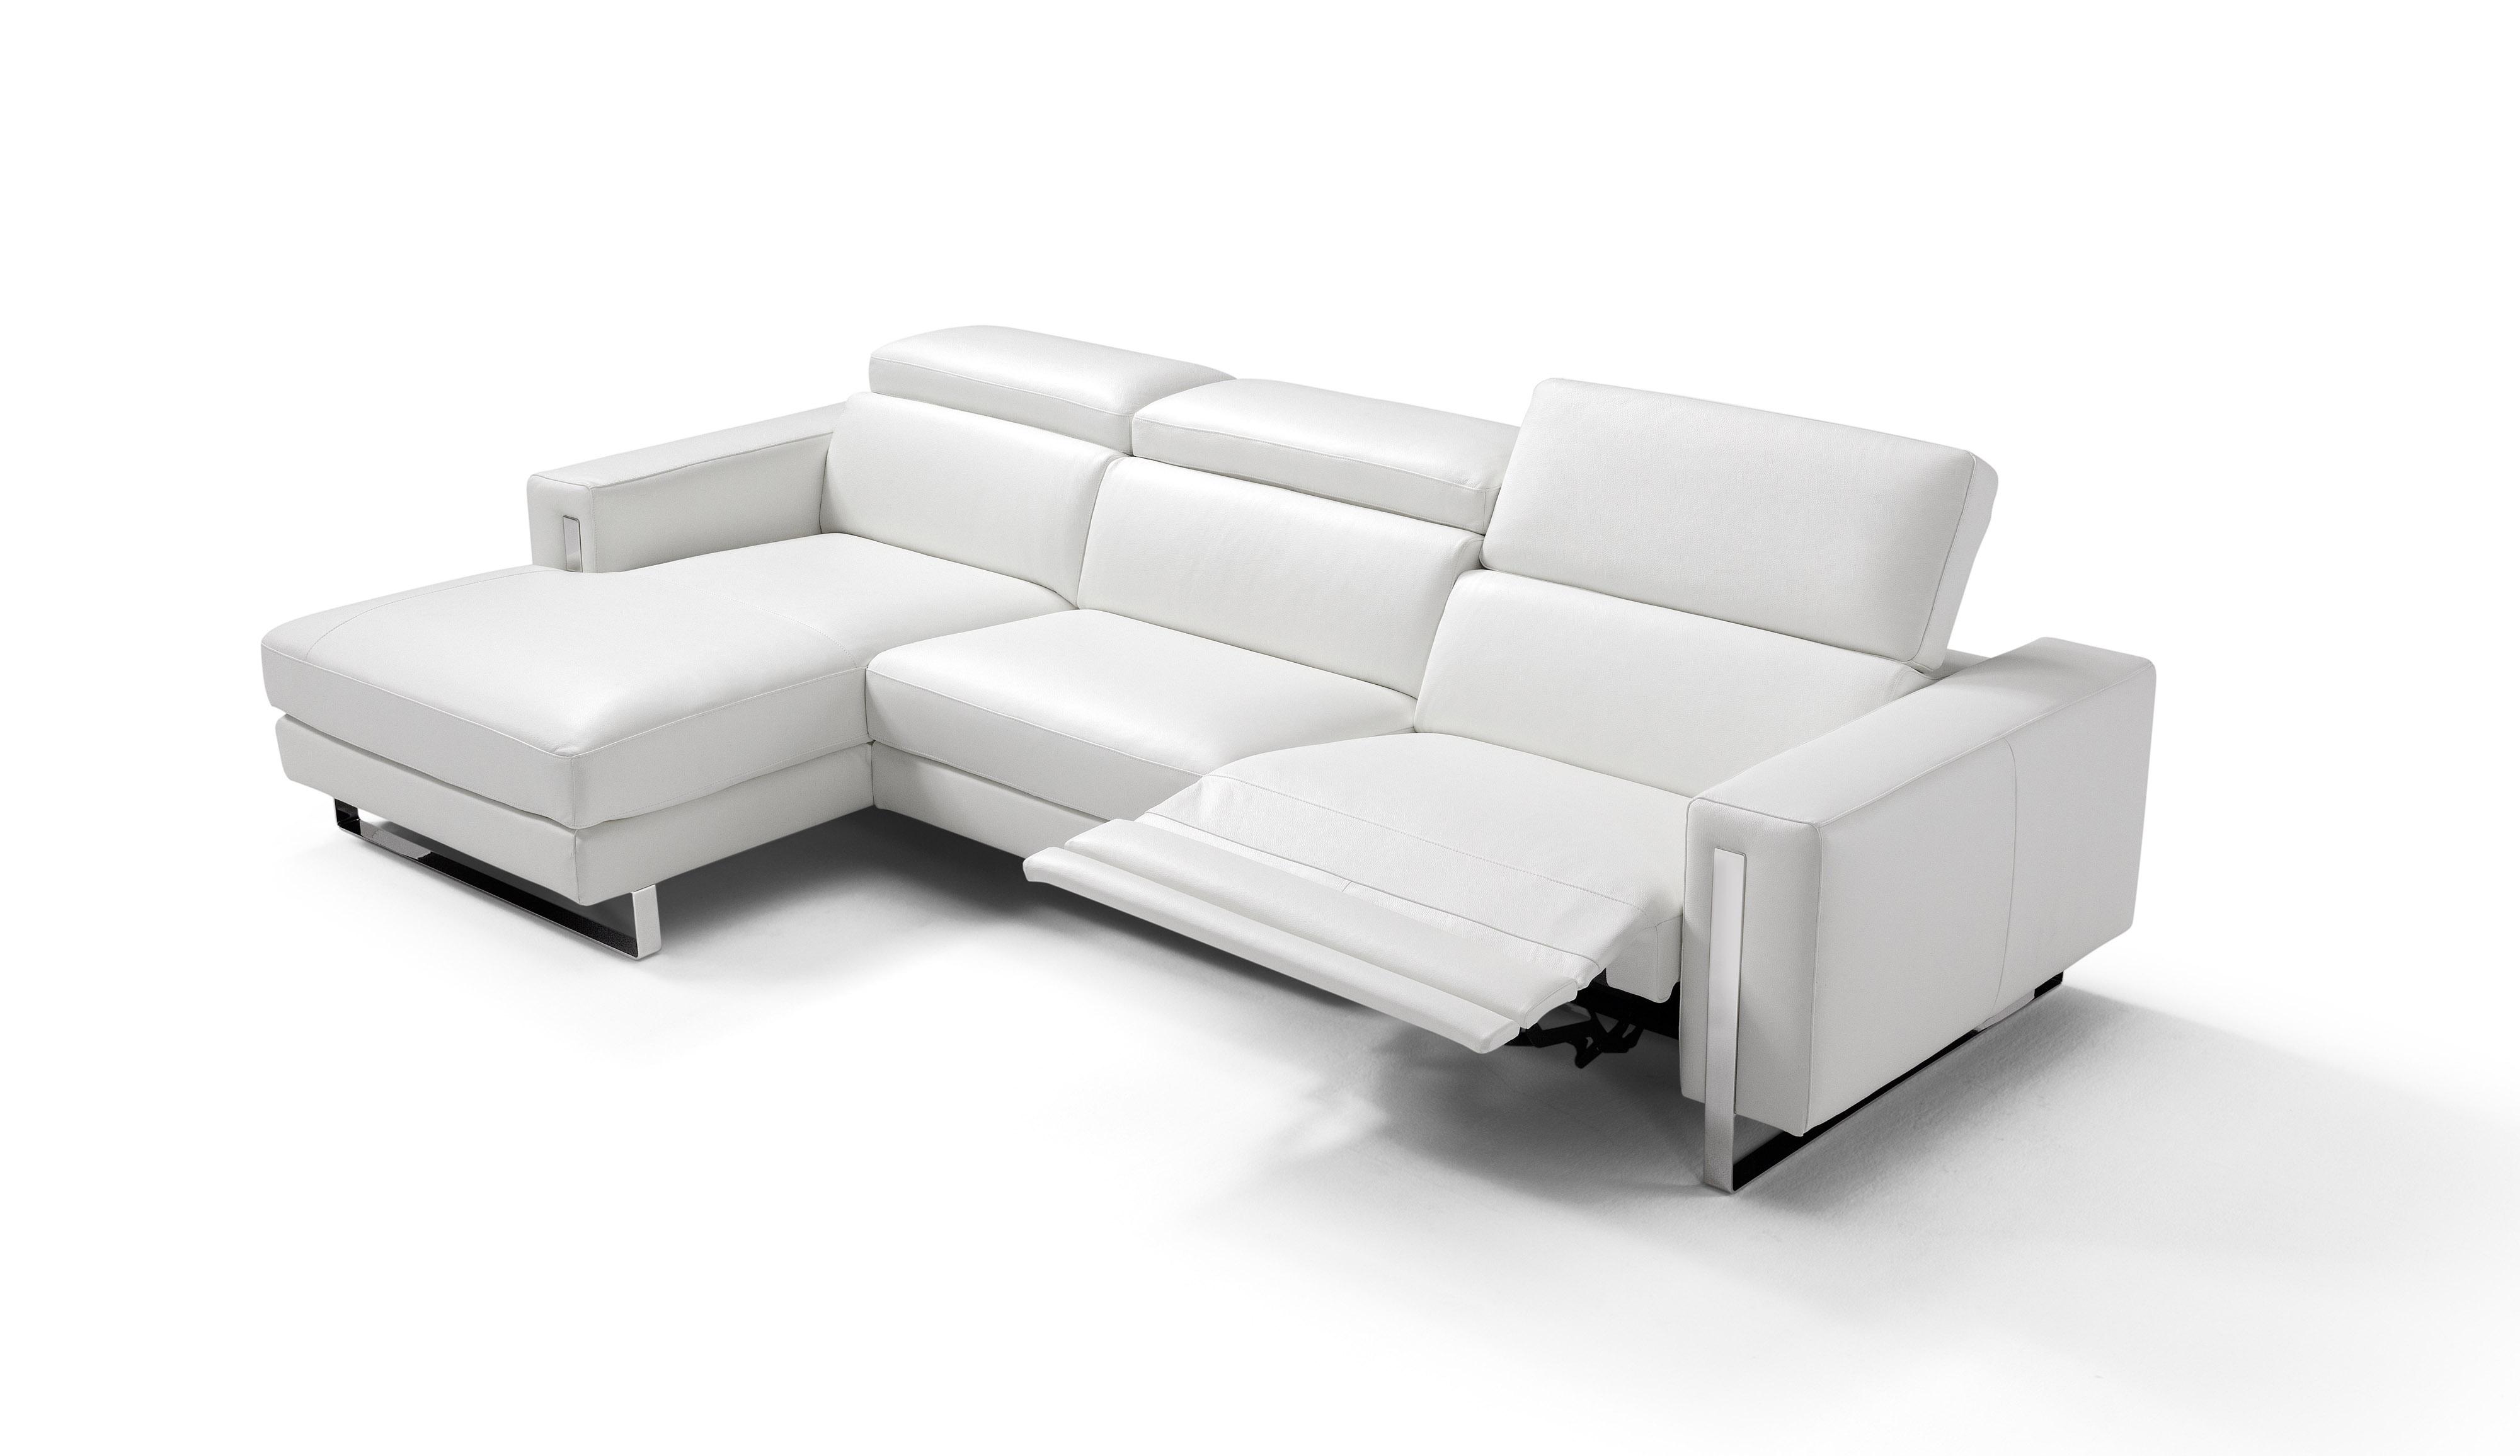 Luxury Furniture Italian Leather Upholstery Pittsburgh